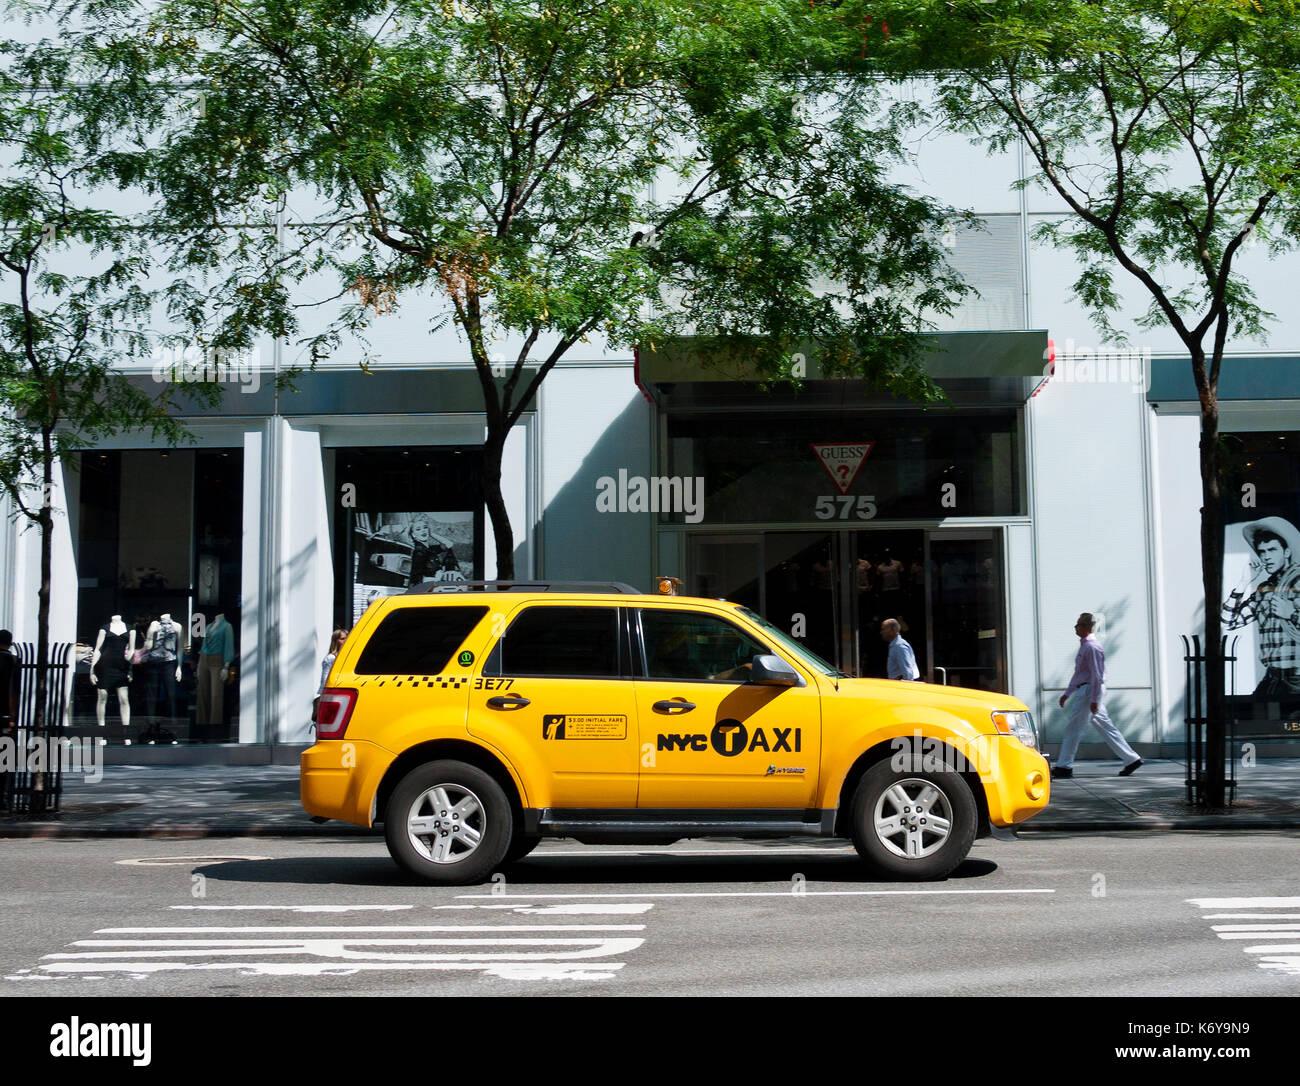 Yellow Taxi Cab Photo Stock